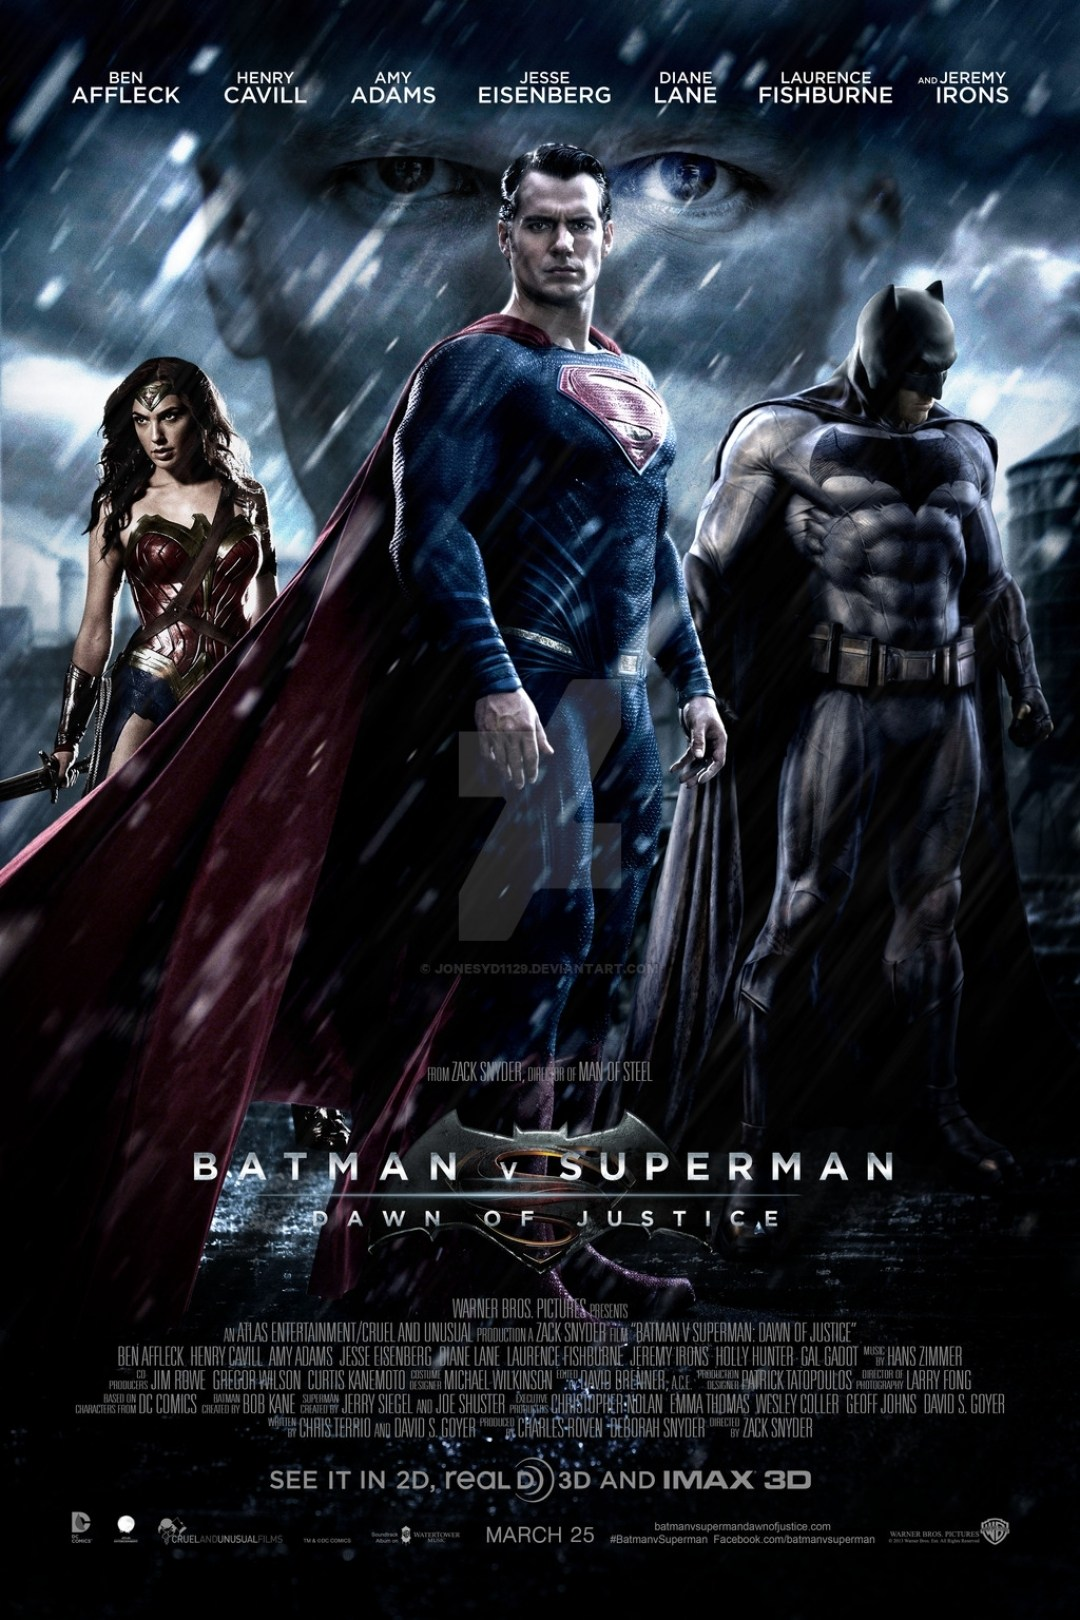 Batman-Vs-Superman-Posters-wallpaper-hd-printable-wonder-woman-all-characters